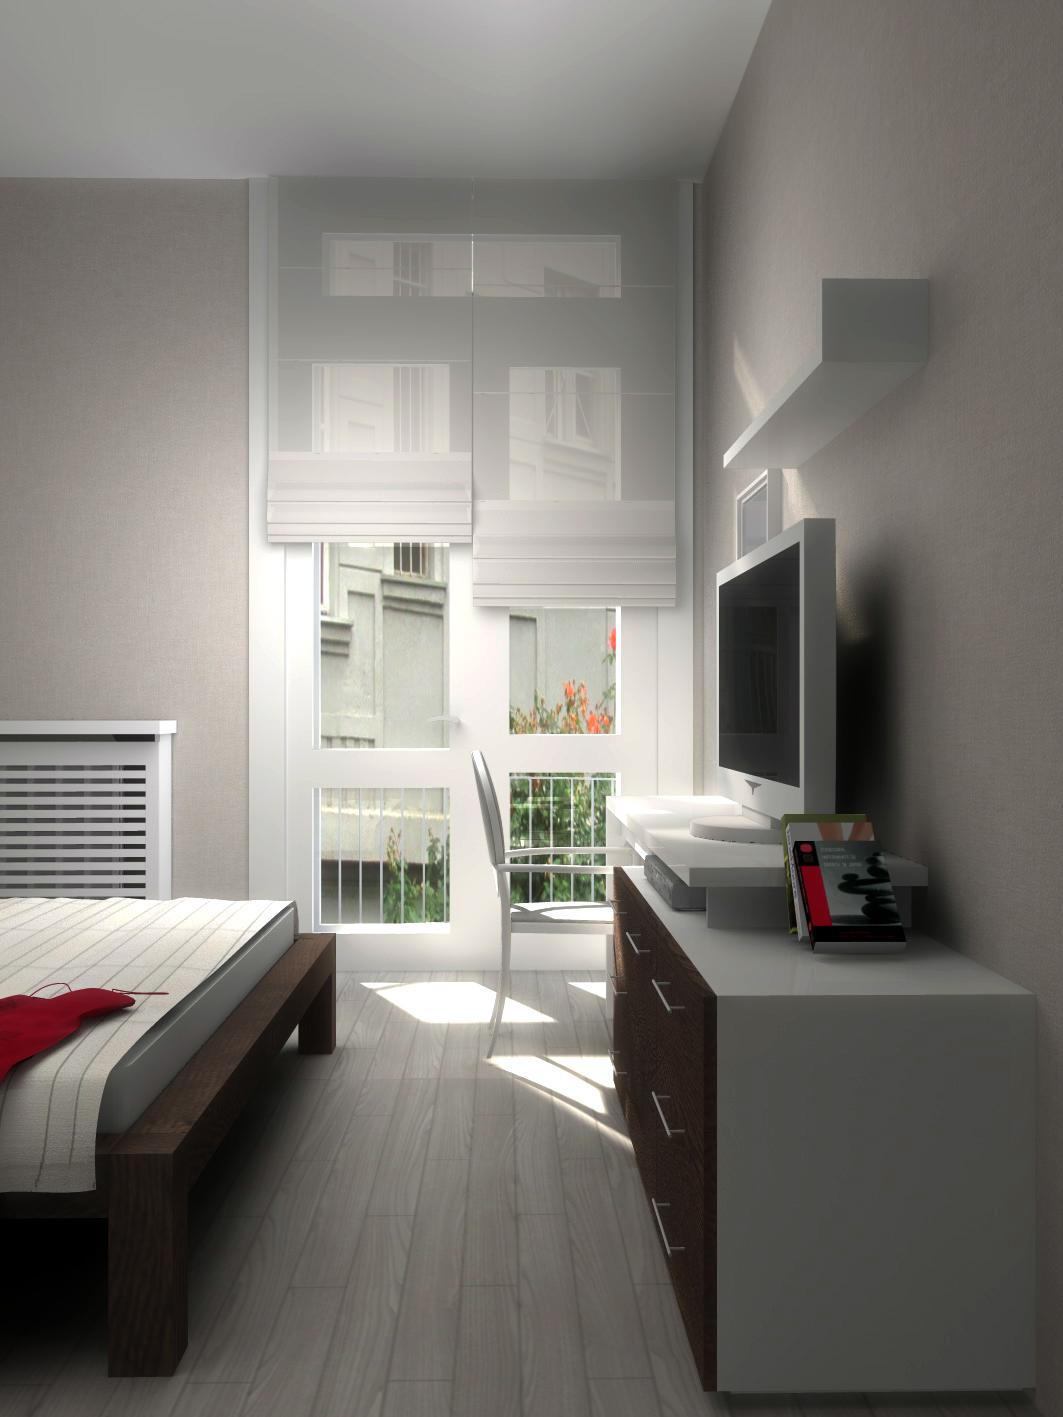 0068_LIVING ROOM